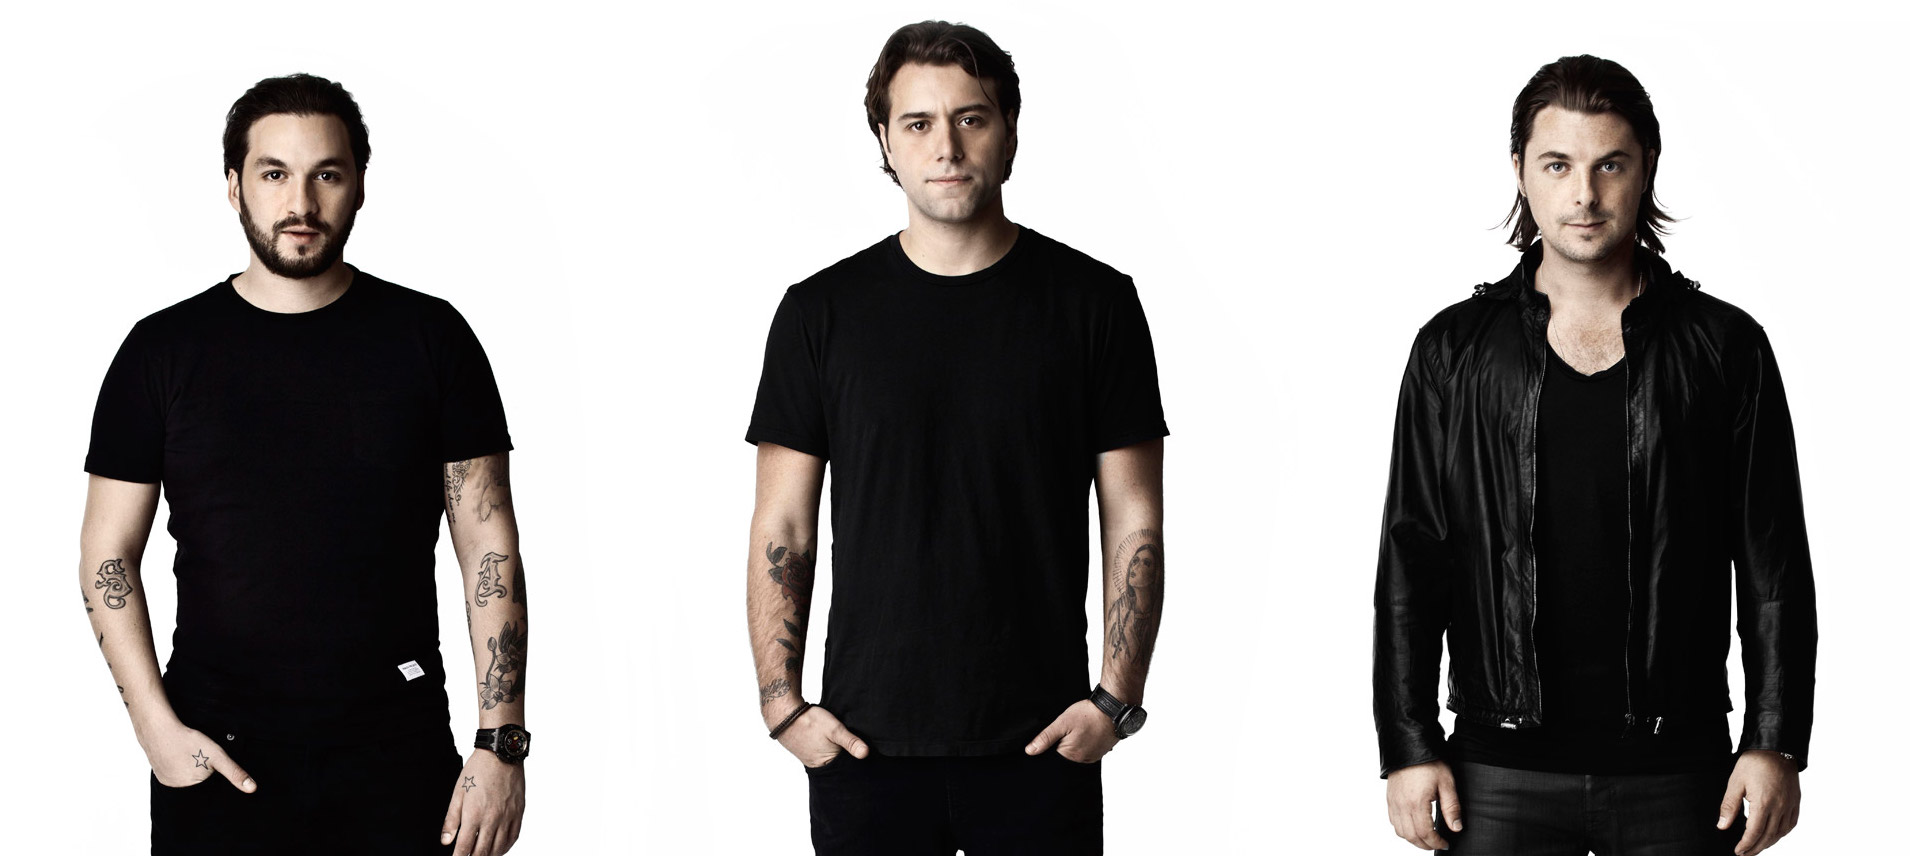 Swedish House Mafia Reunite In Los Angeles, Sort Of